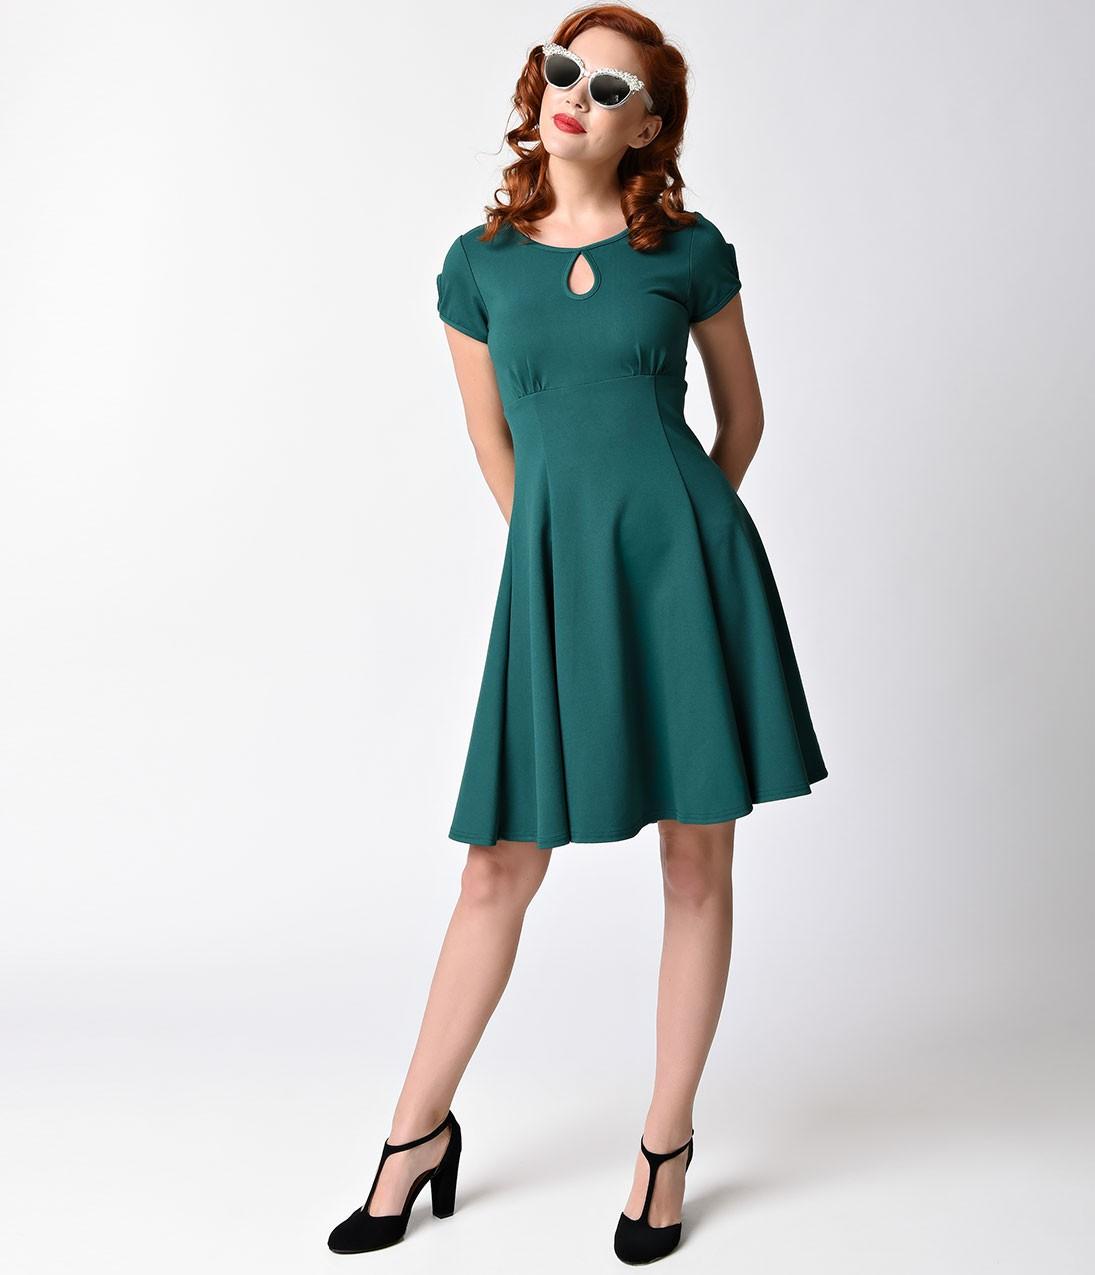 6b148bd340d3 Ντύσου σαν την Emma Stone στο La La Land